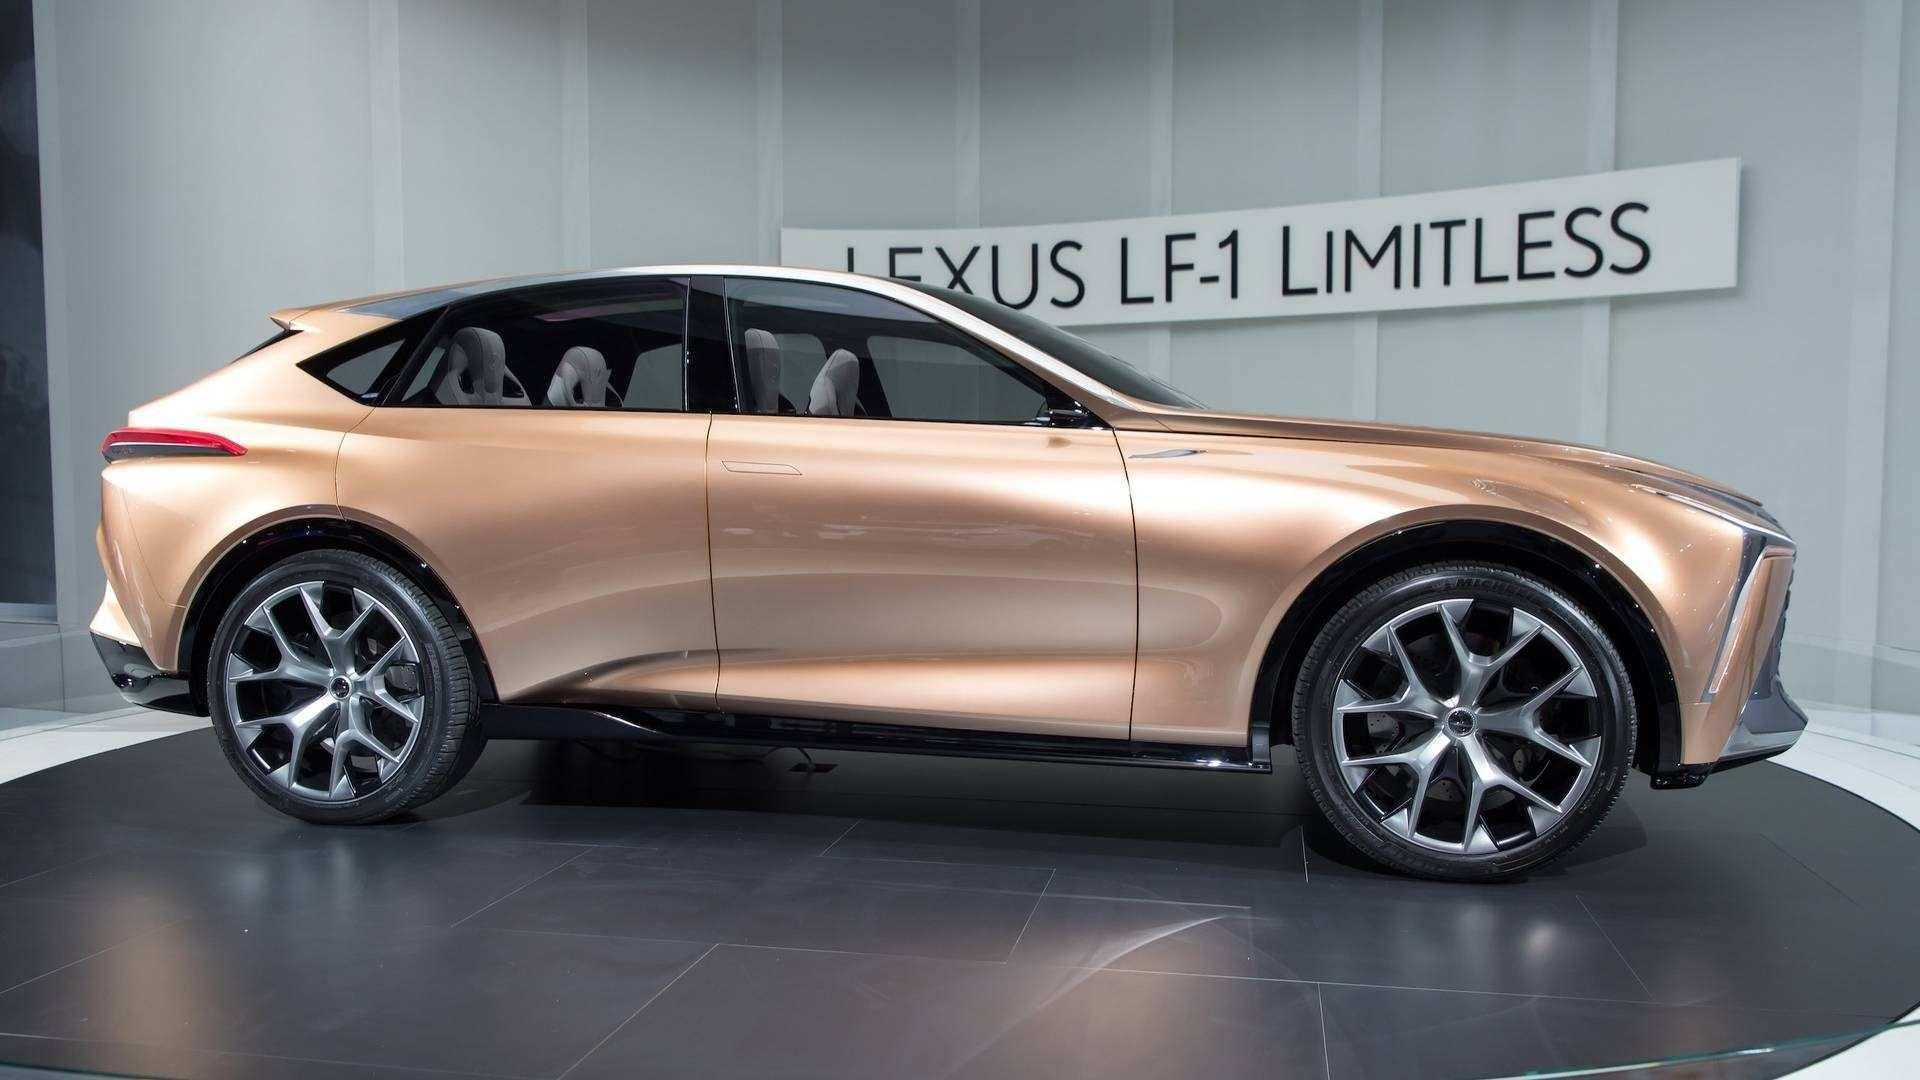 15 The Lexus Lf 1 Limitless 2020 Spy Shoot for Lexus Lf 1 Limitless 2020